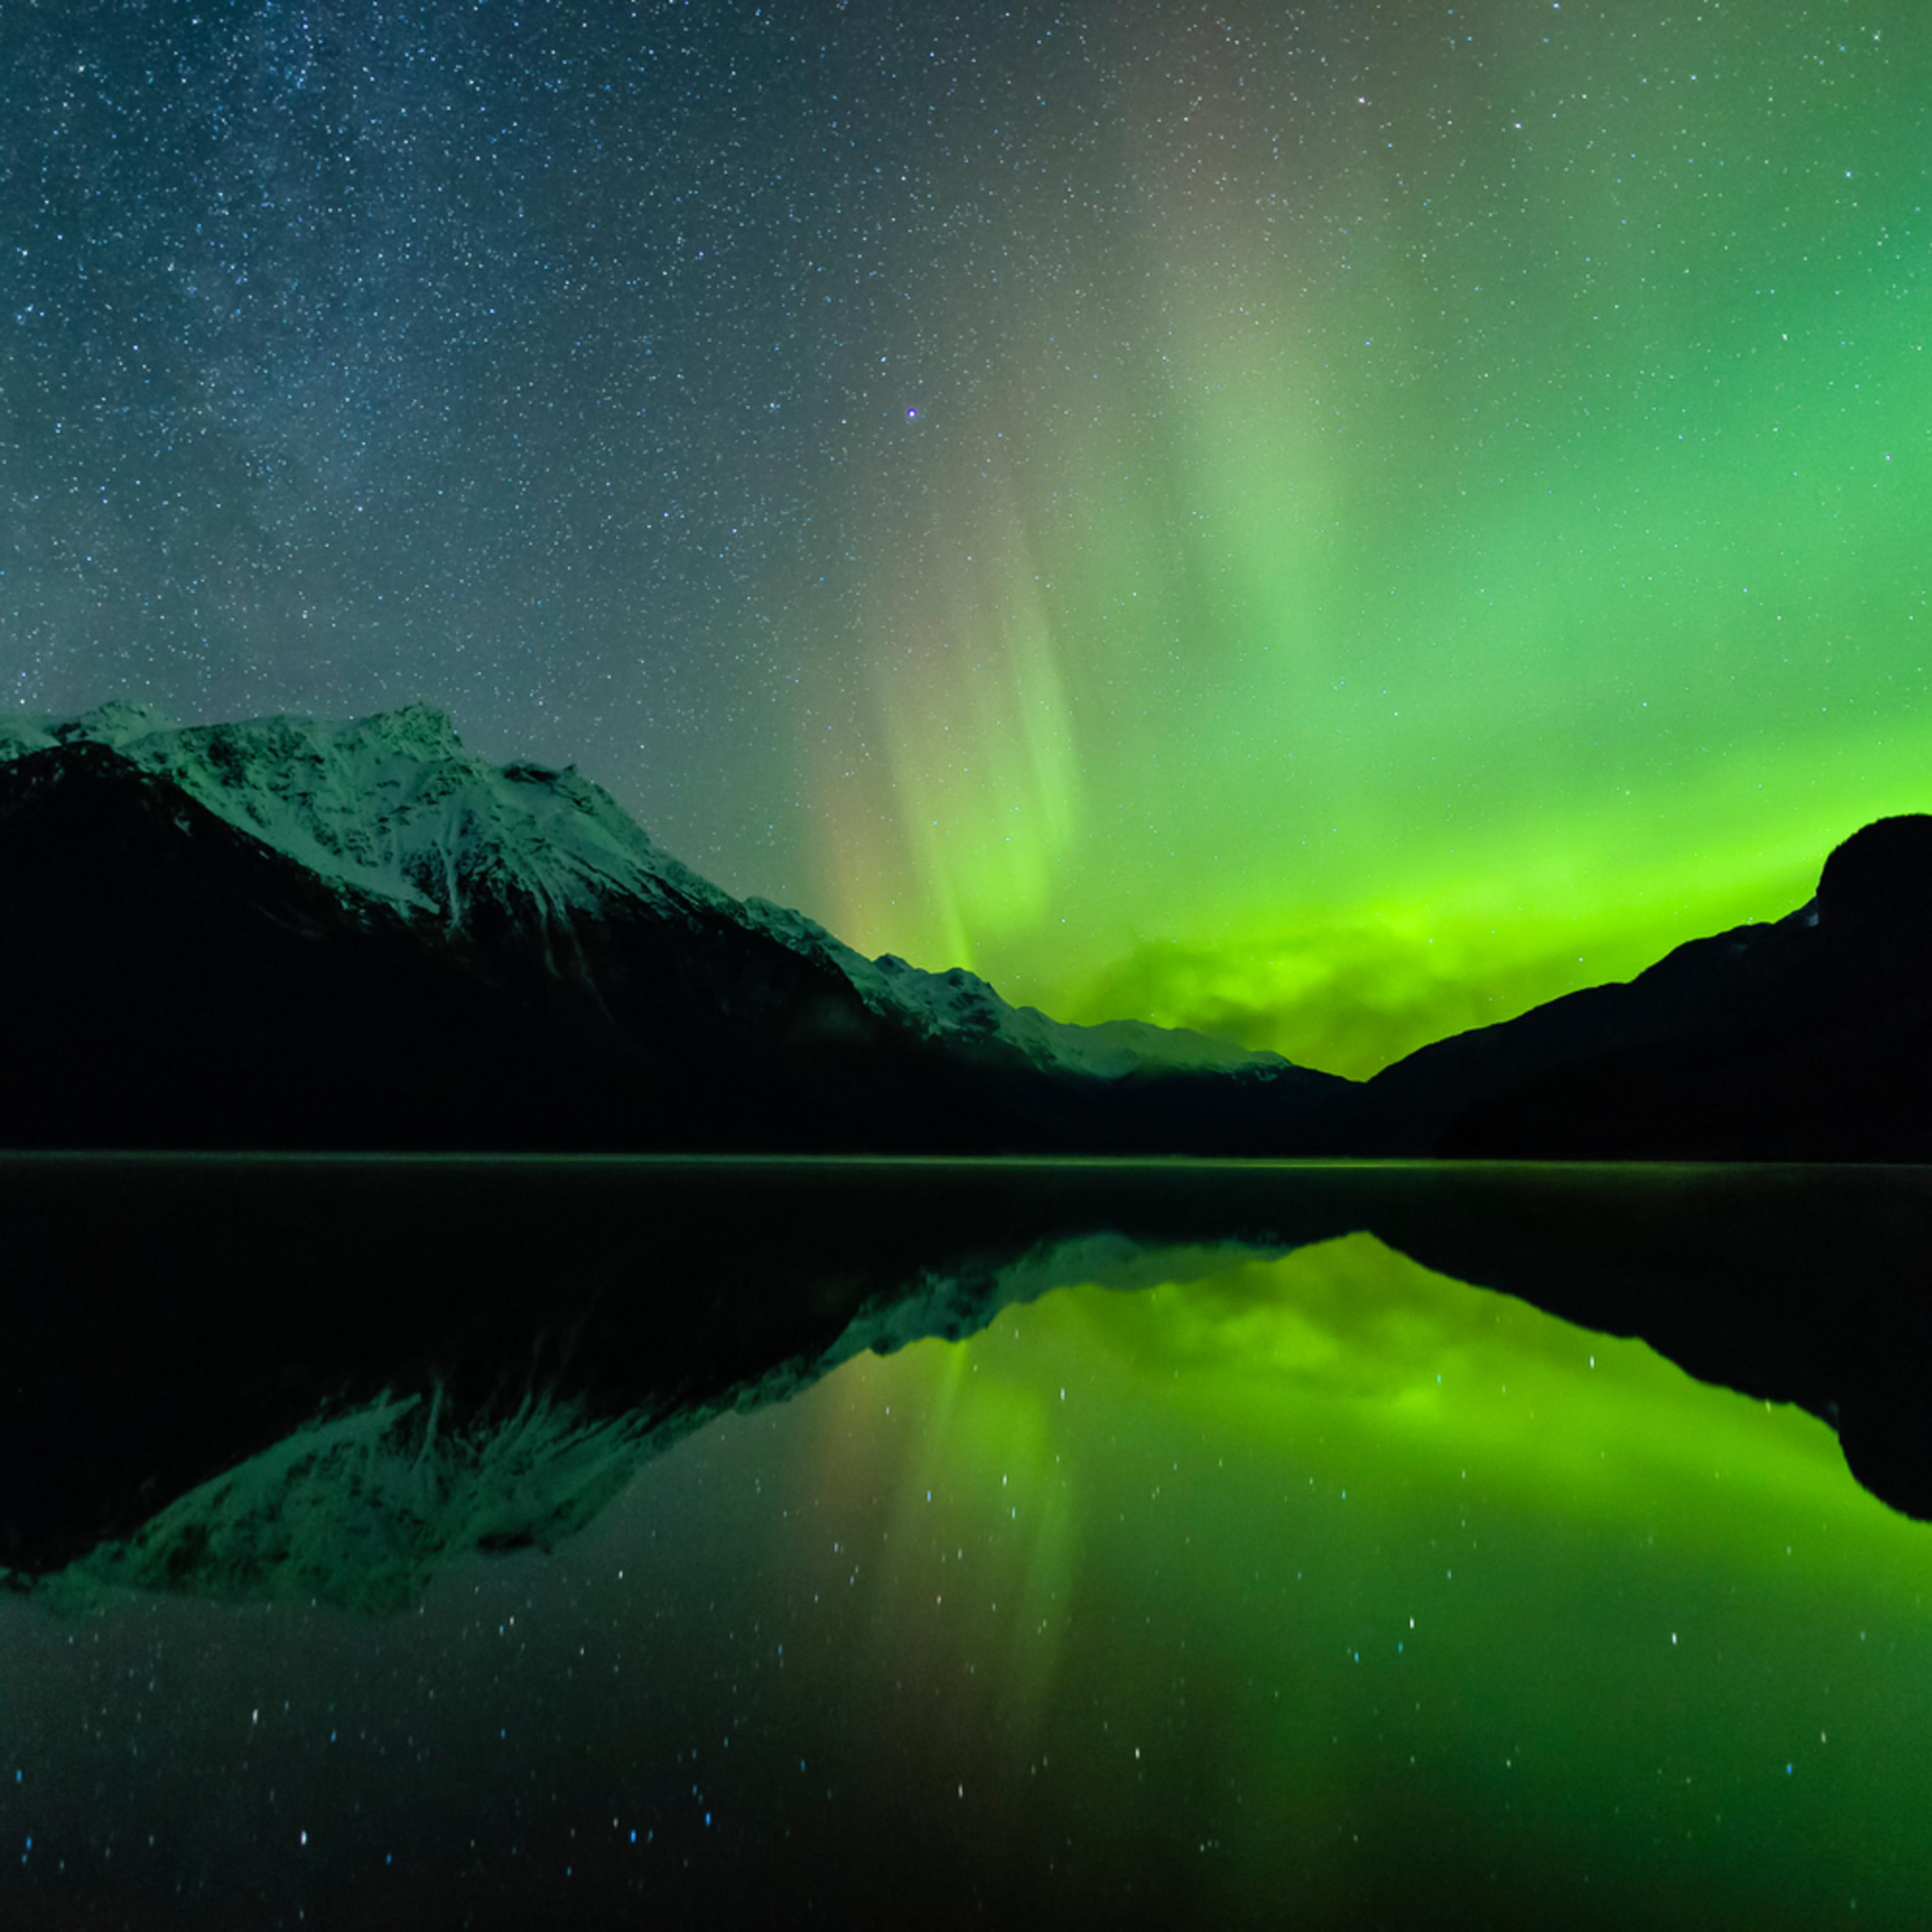 20141114 chilkoot lake 39195 artstorefronts wps4f6